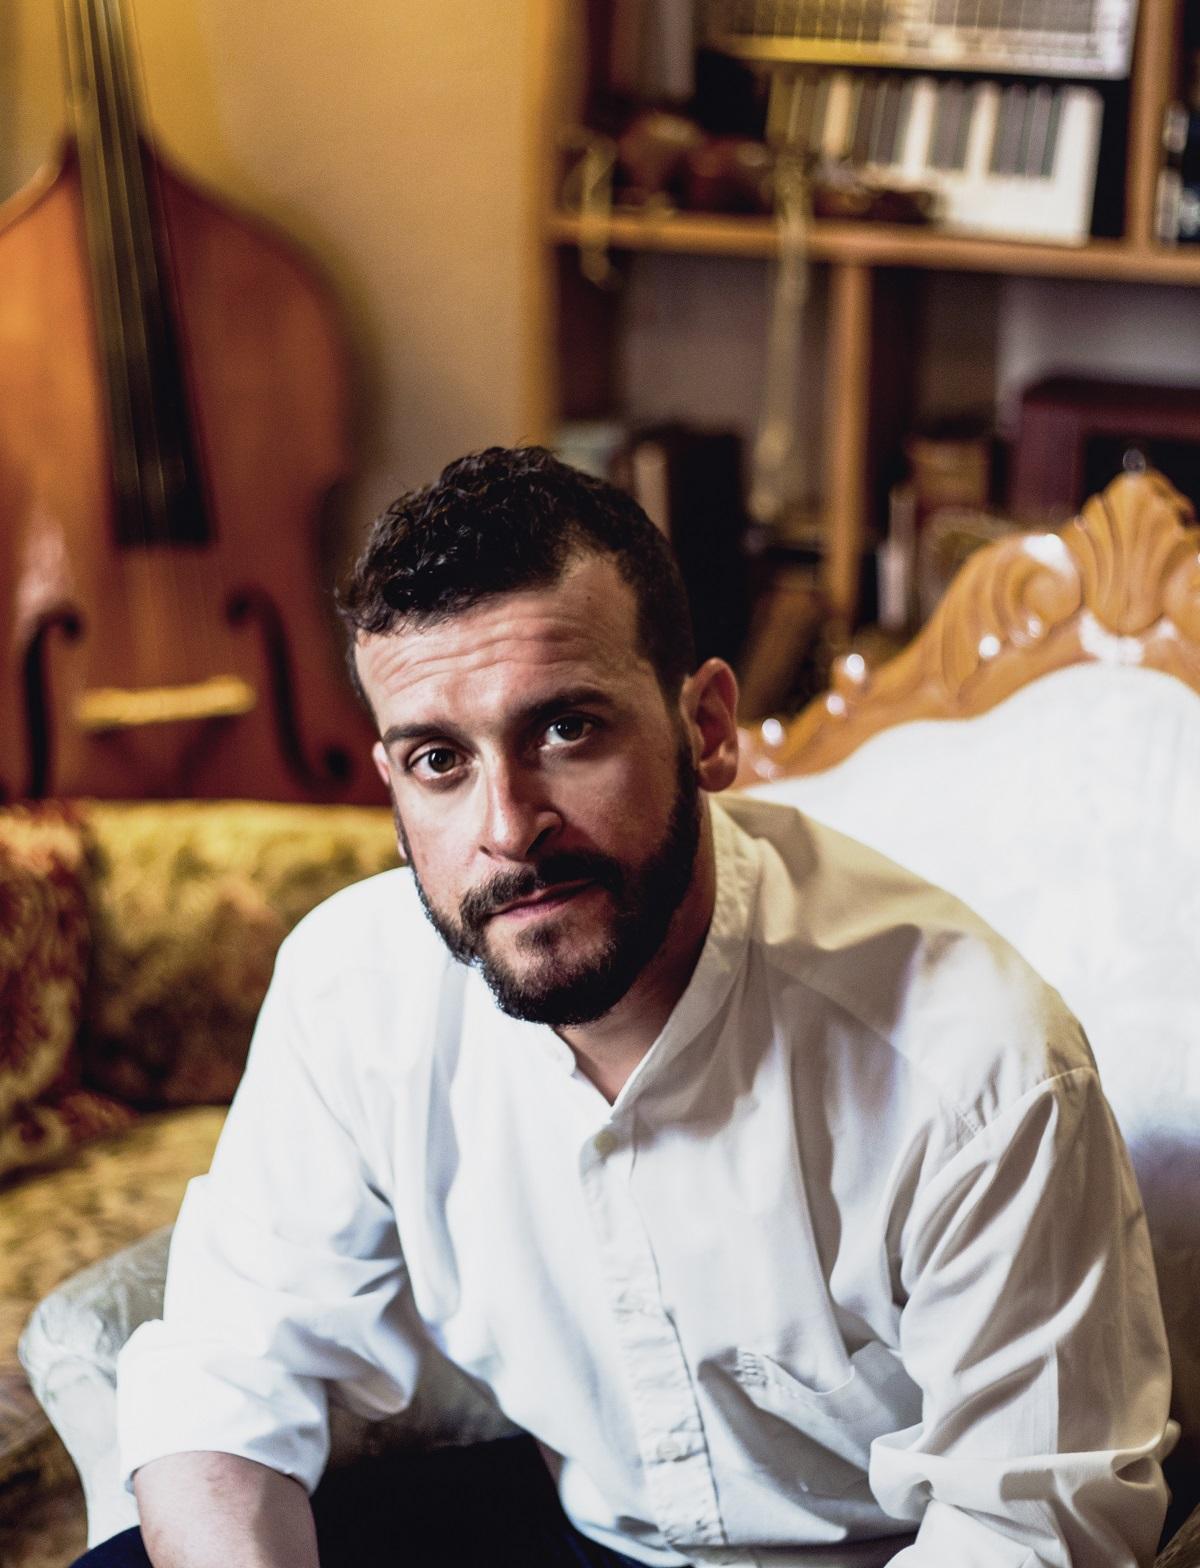 Paco Perera